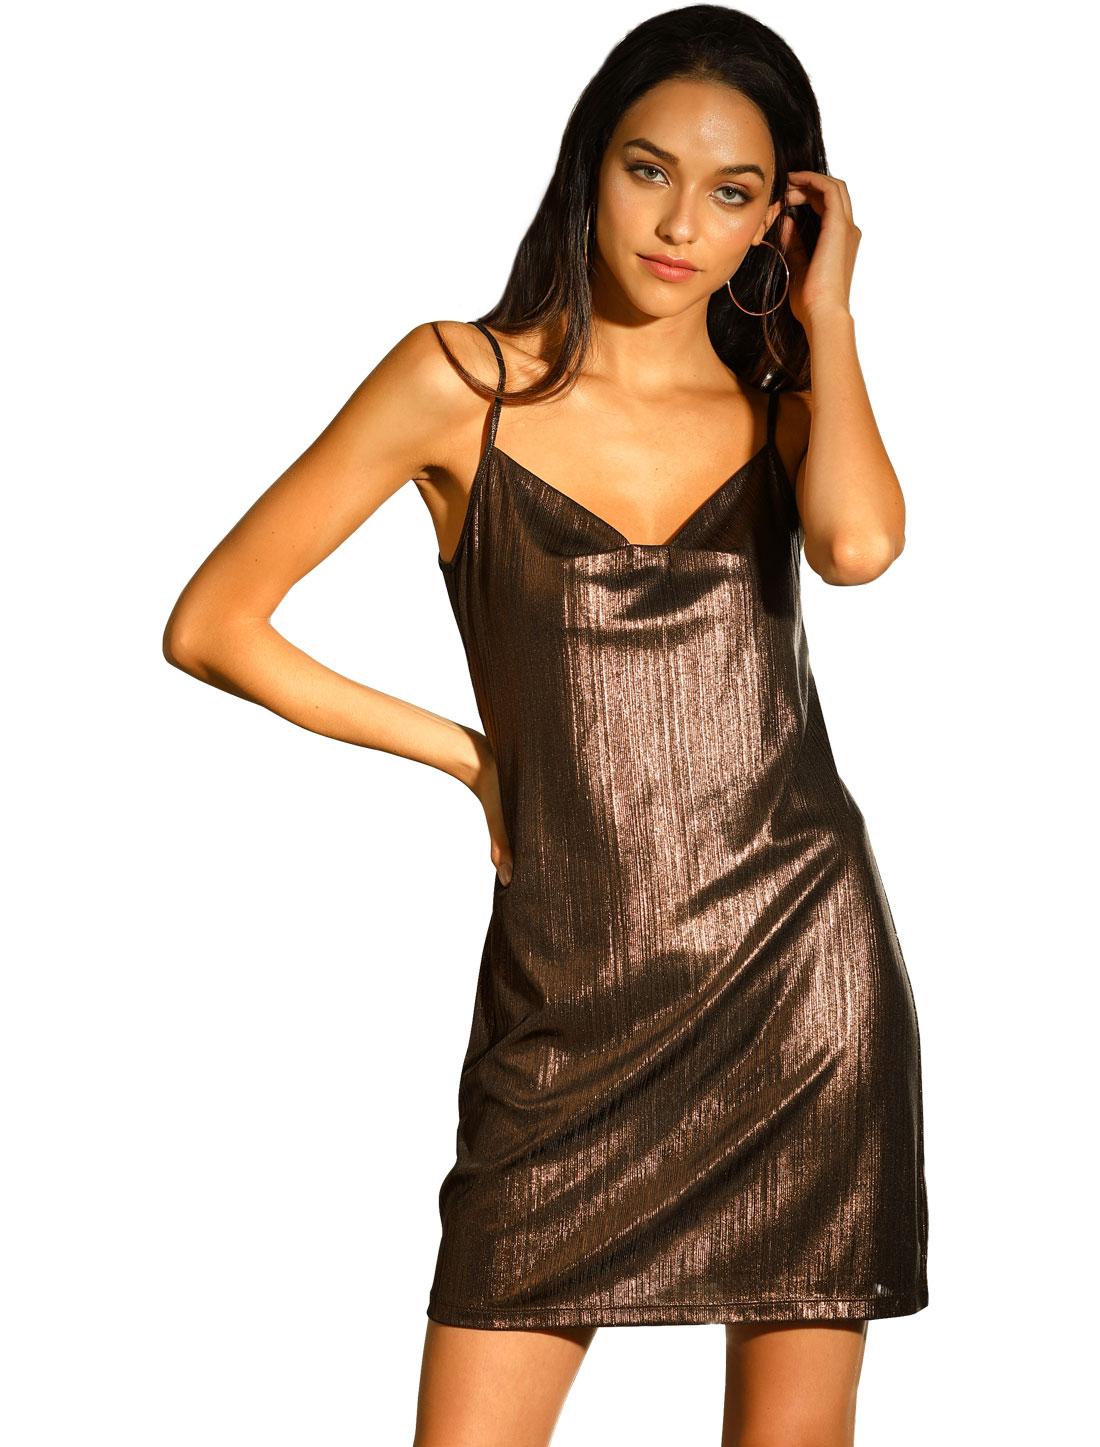 Allegra K Women's Sparkly Glitter Spaghetti Strap Party Dress Coffee Brown S